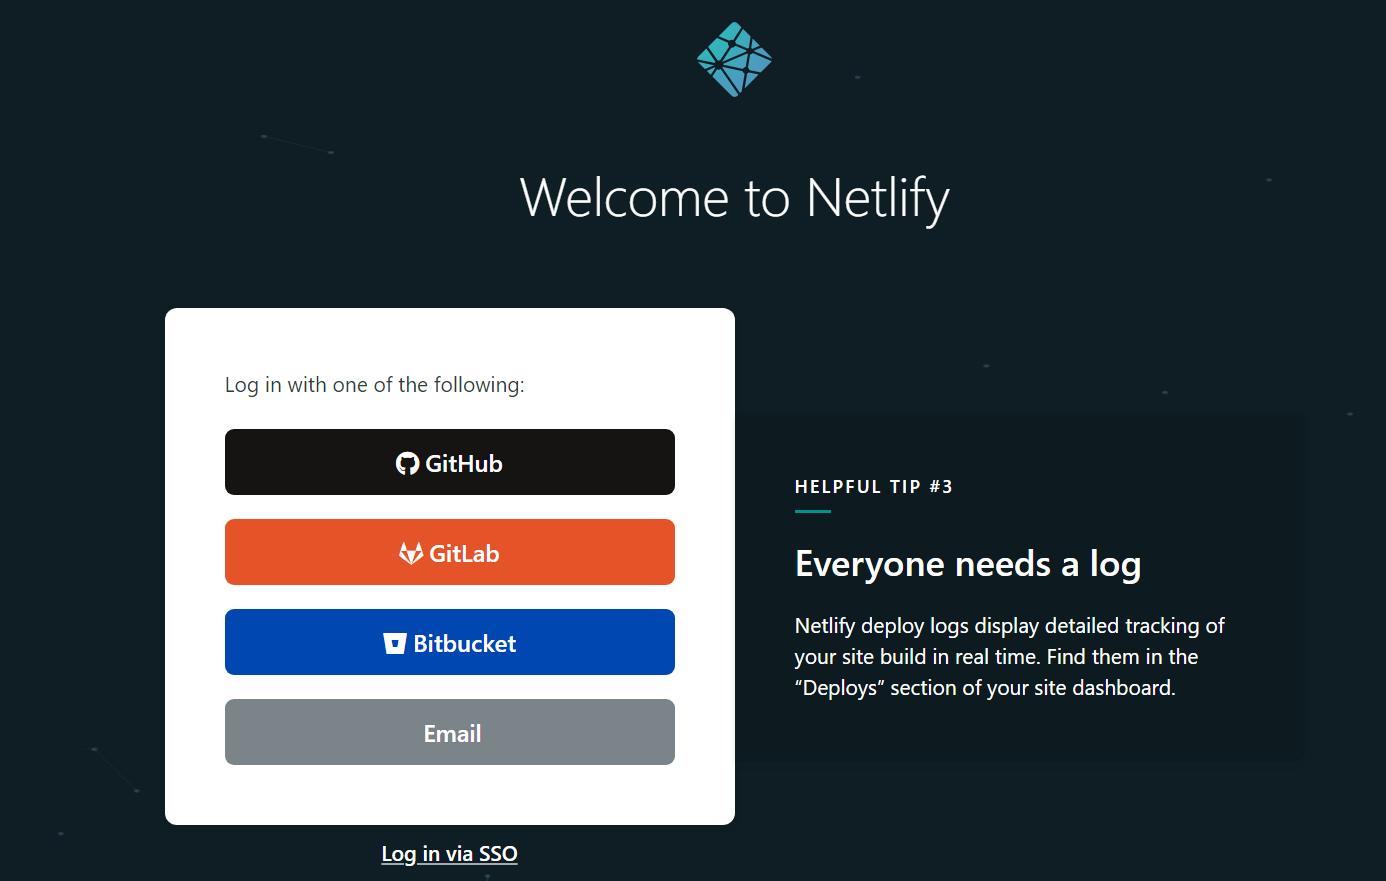 Netlify Make Account